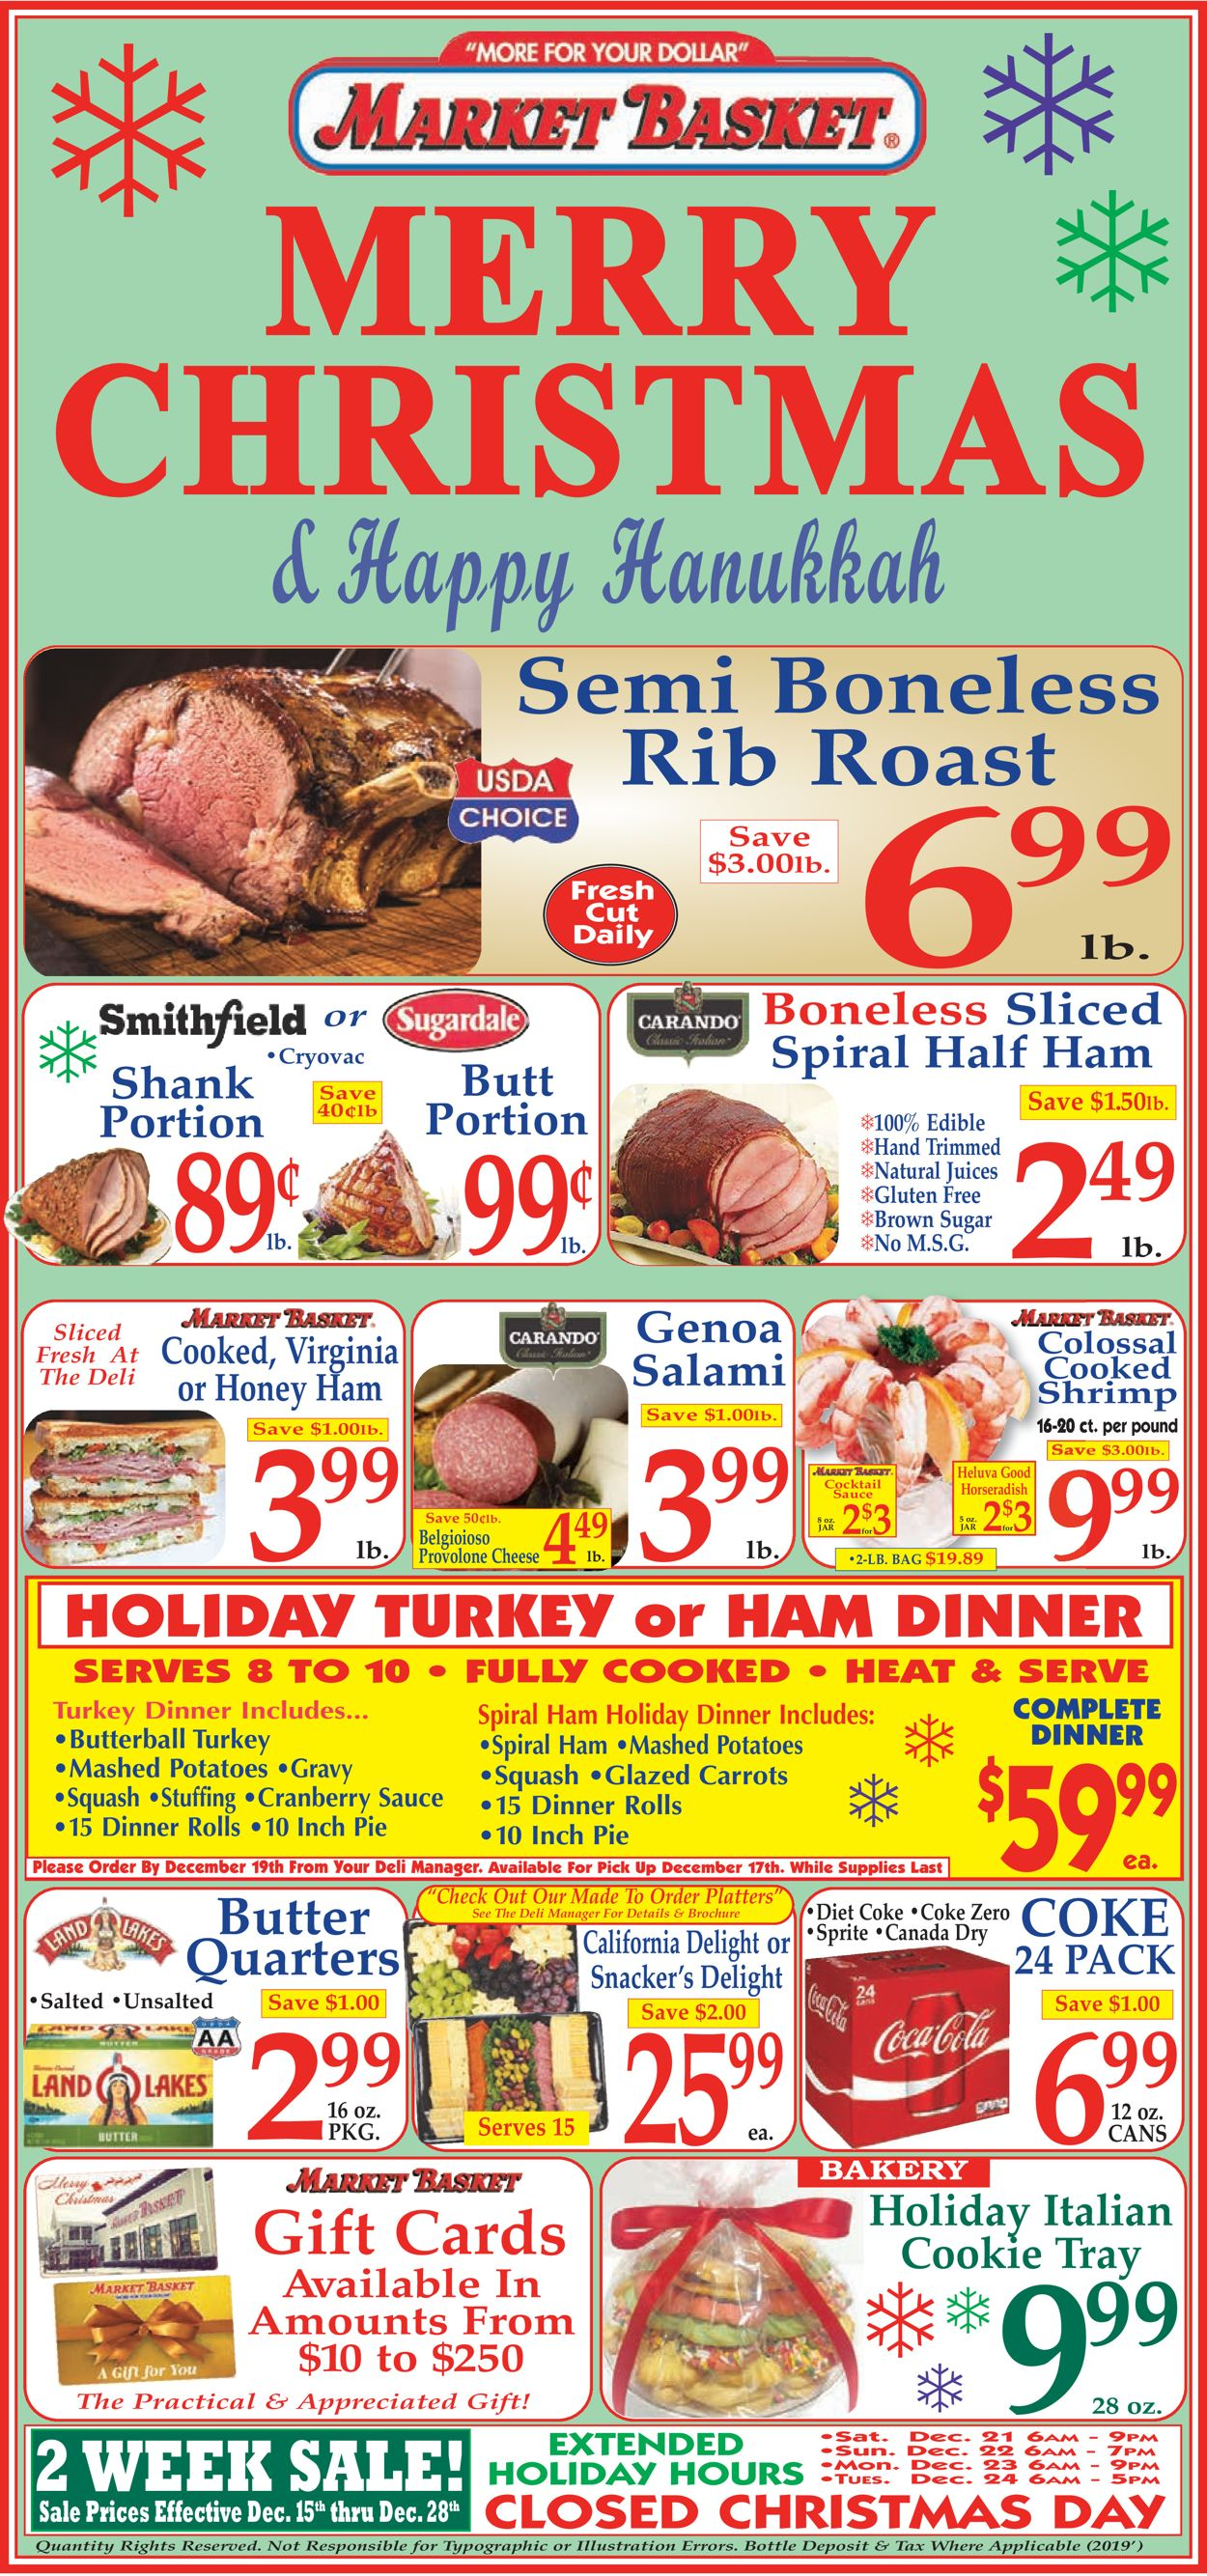 Market Basket Bakery Christmas 2020 Market Basket   Christmas Ad 2019 Current weekly ad 12/15   12/28